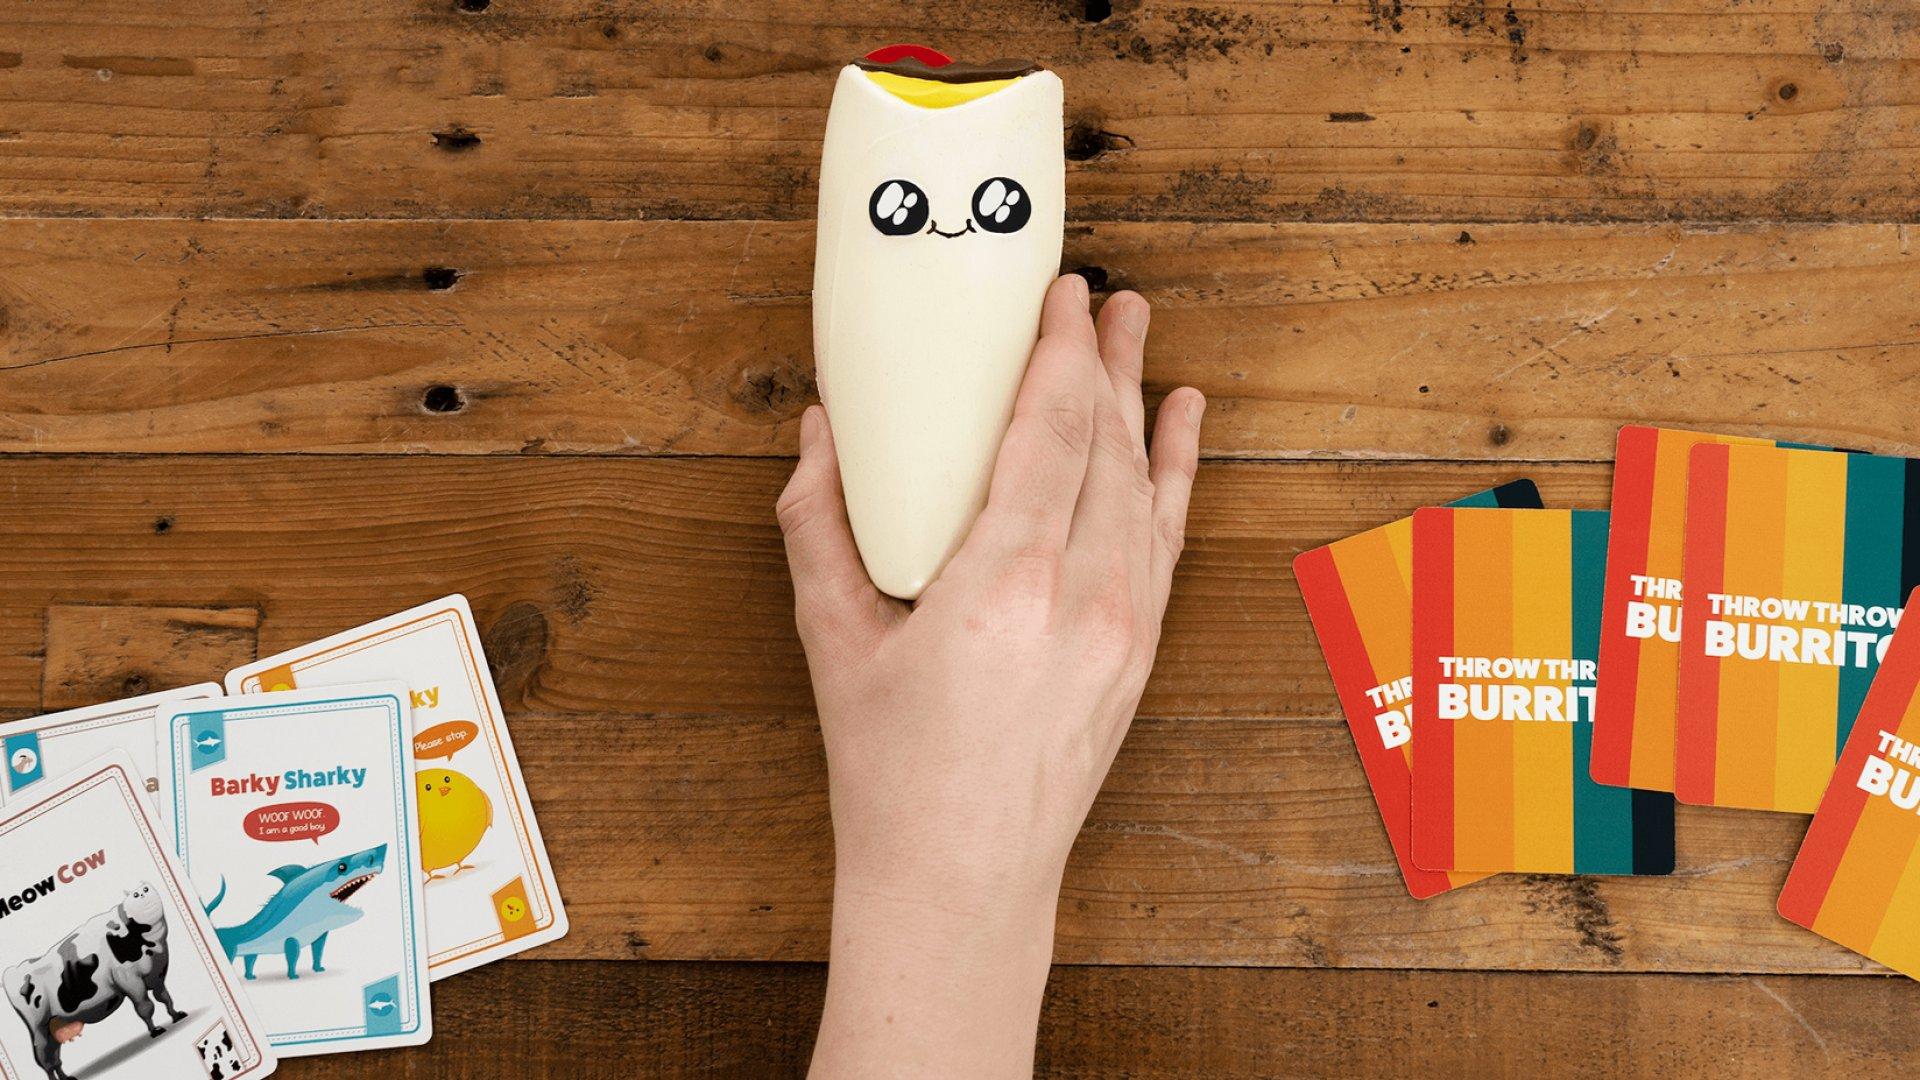 Throw Throw Burrito board game.